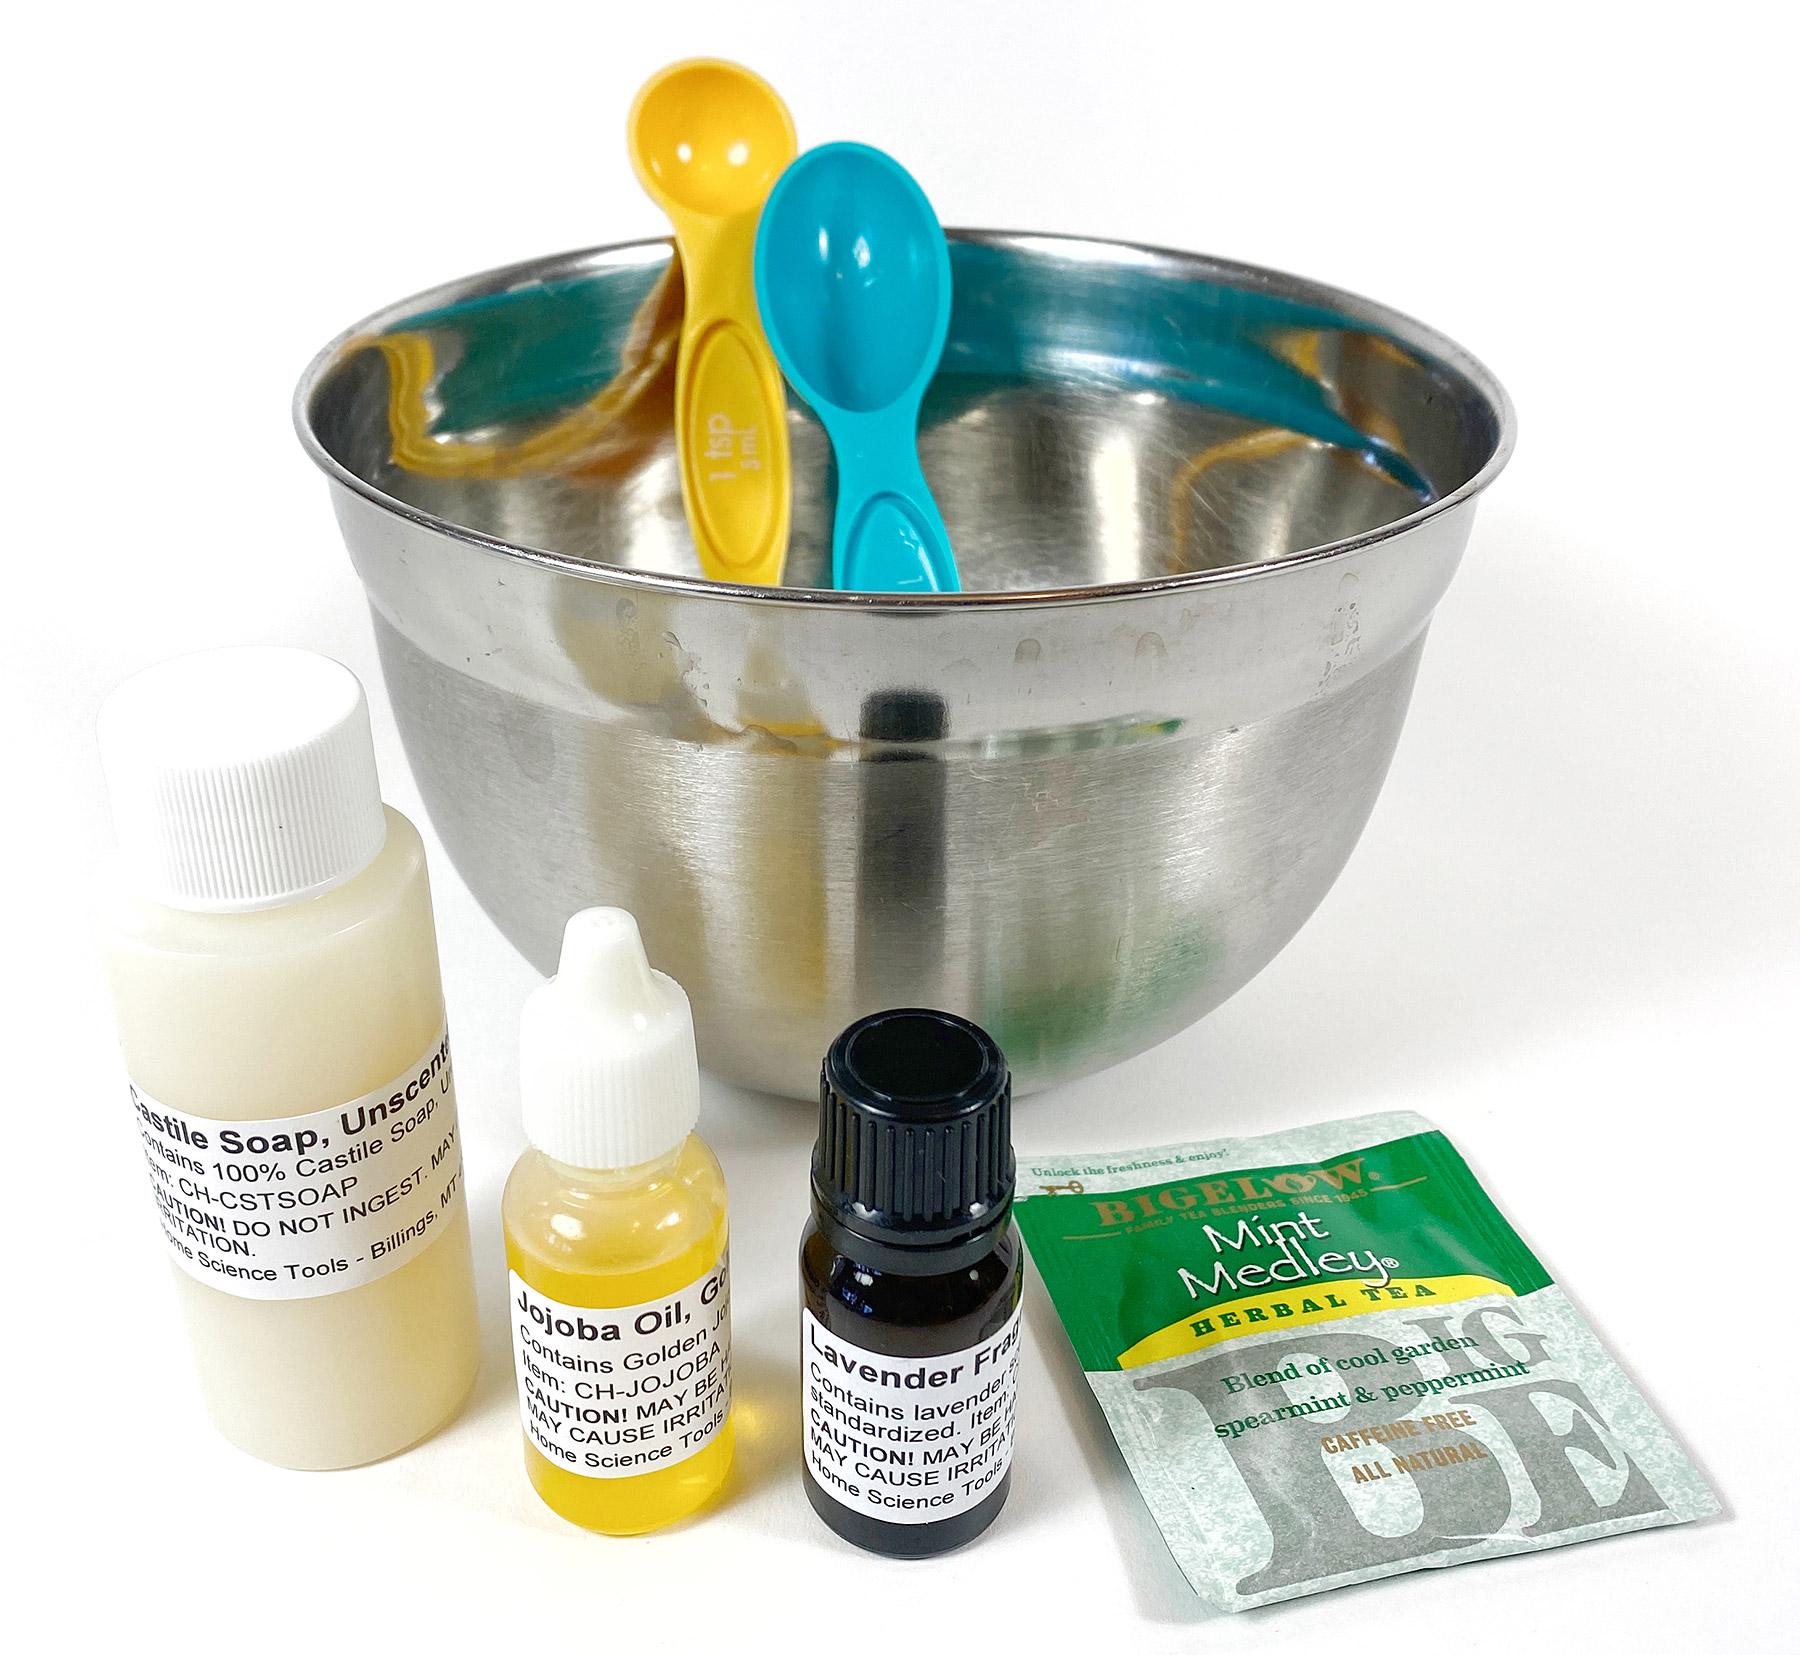 Castile soap herbal shampoo ingredients